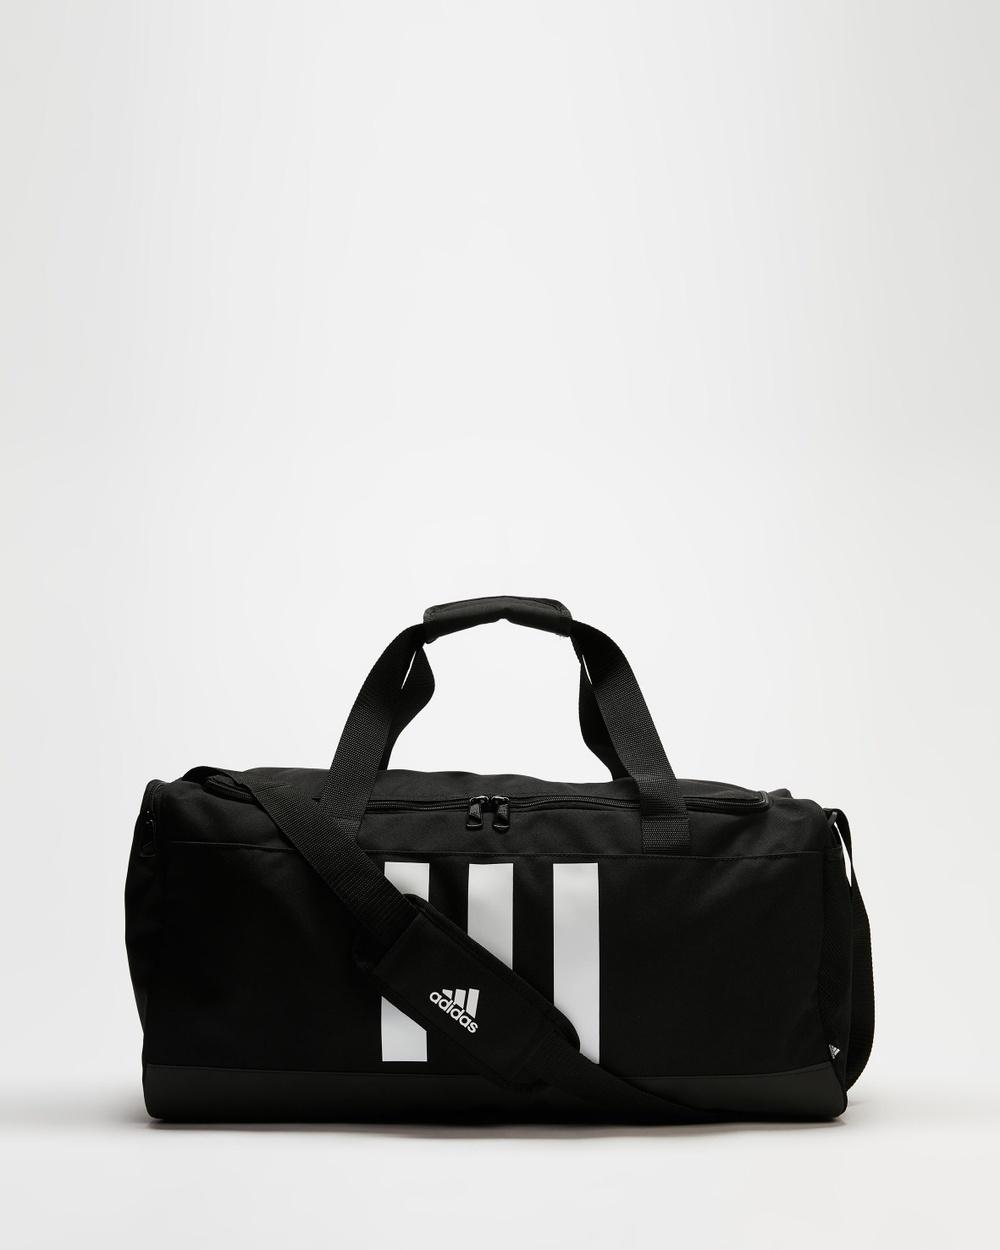 adidas Performance Essentials 3 Stripes Small Duffle Bag Bags Black & White 3-Stripes